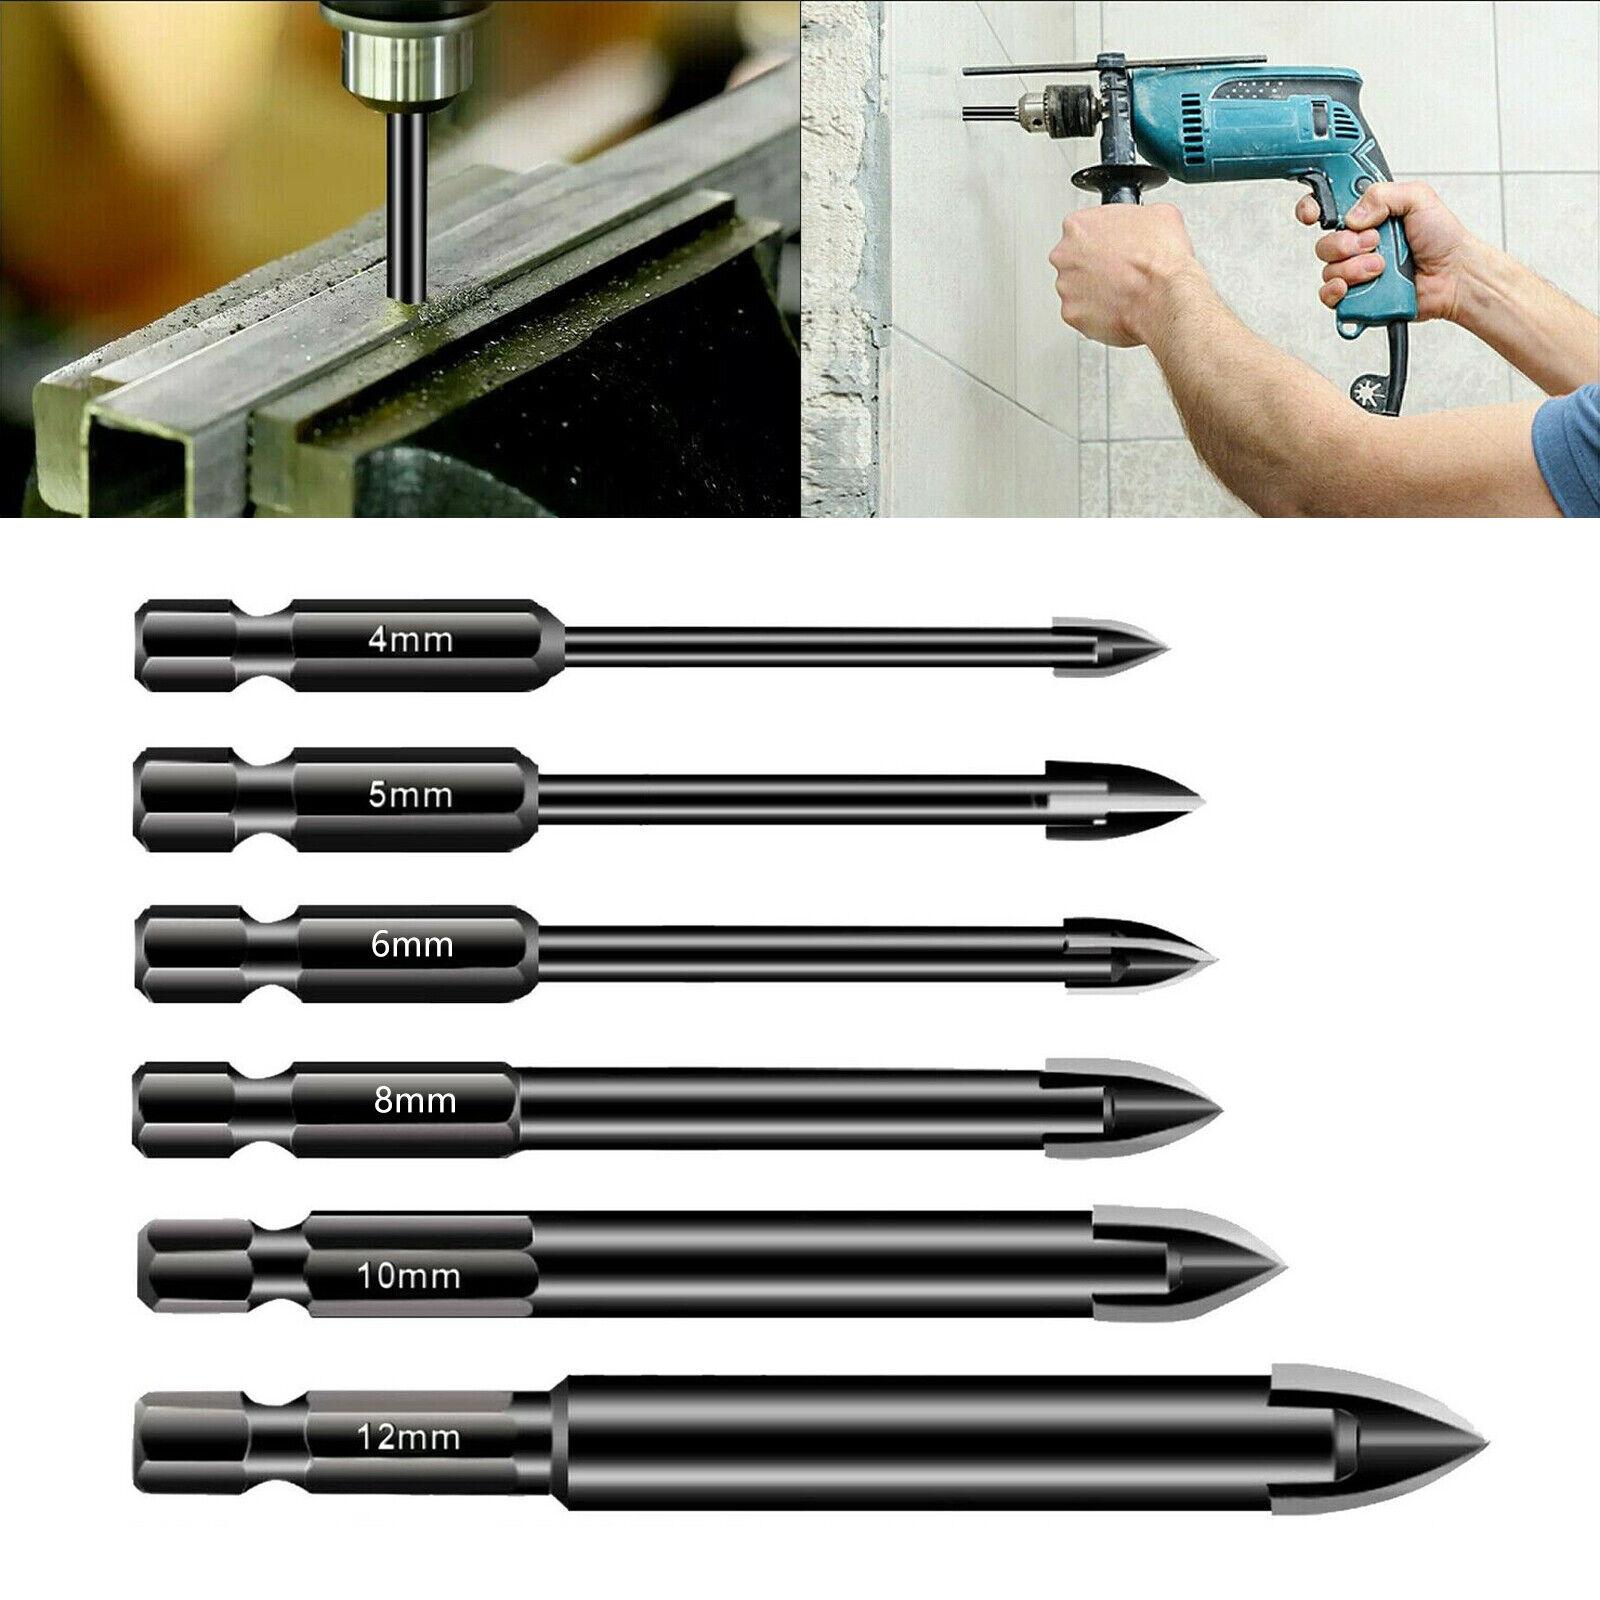 6xPorcelain Tile Mirror Glass Ceramic Drill Bits Set 4/5/6/8/10/12mm Spear Heads